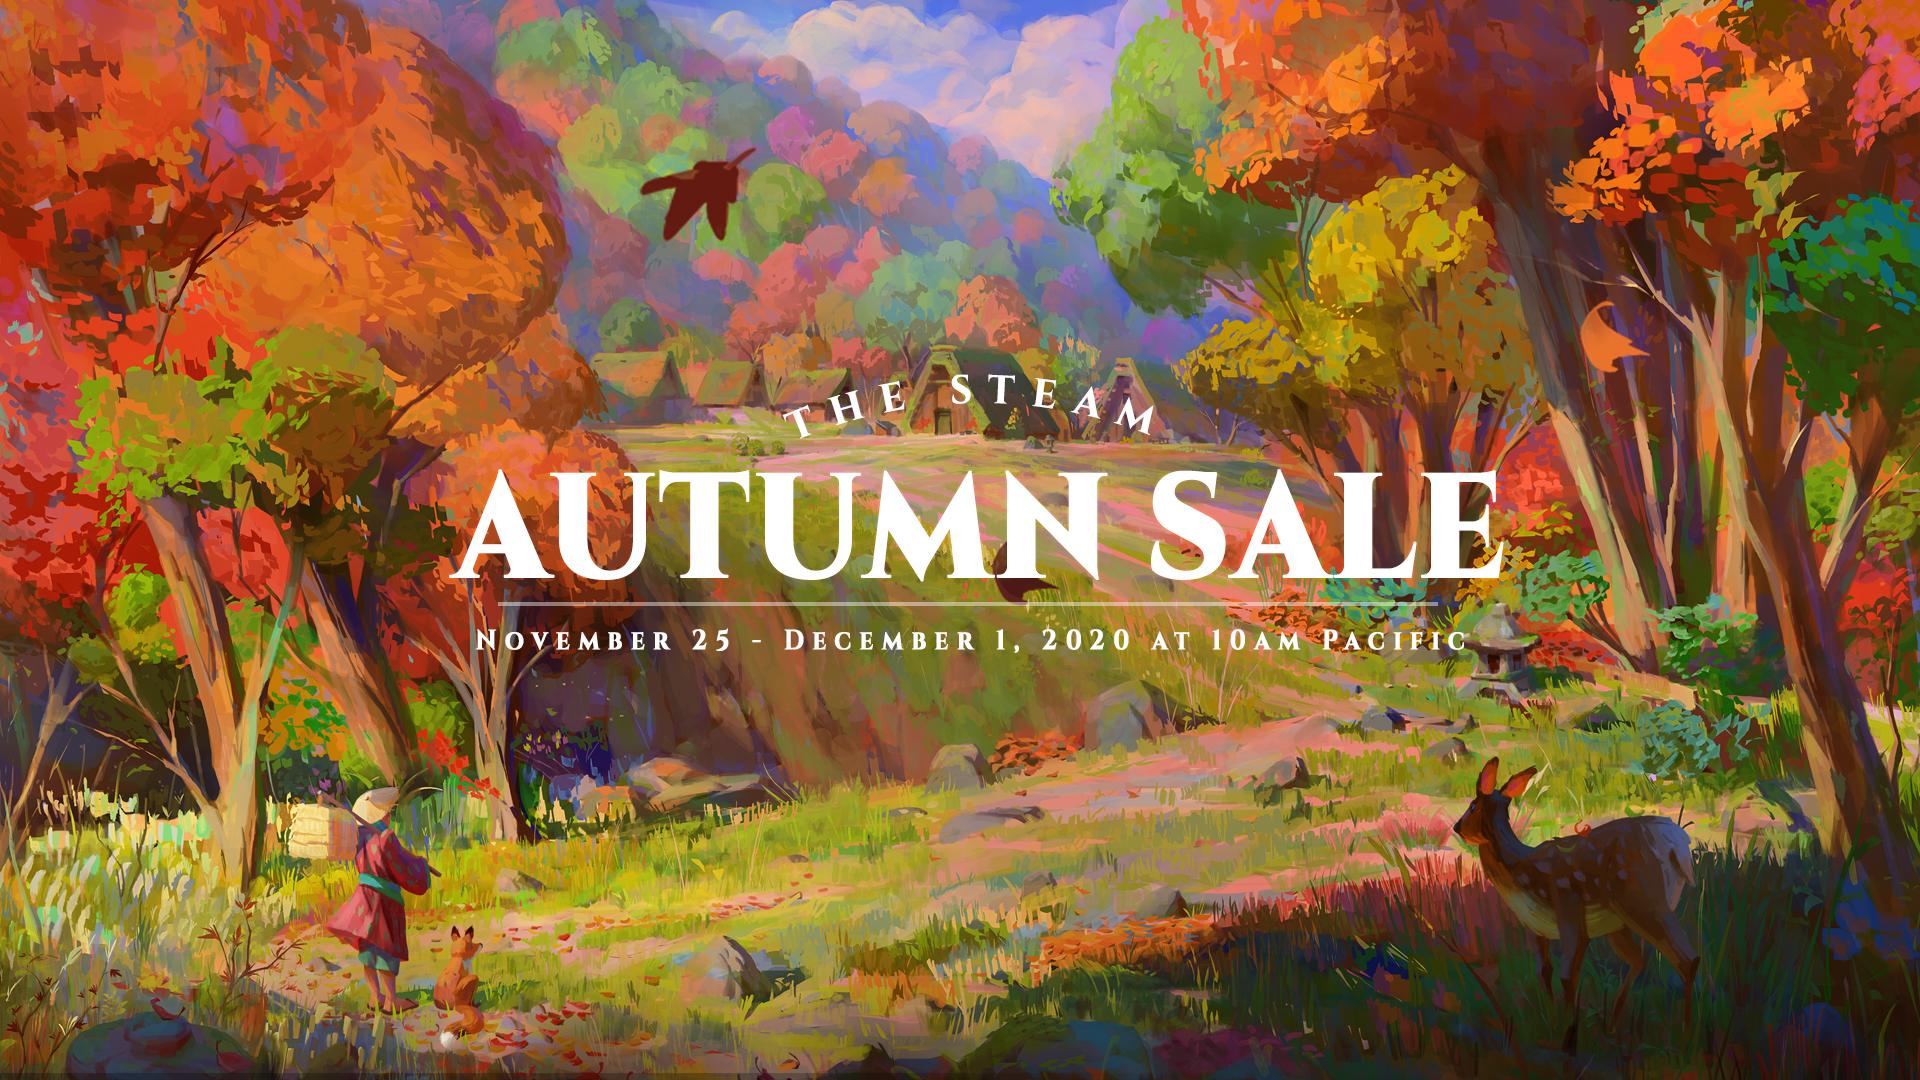 Steam - Autumn PC Video Game sale Nov 25 to Dec 1st